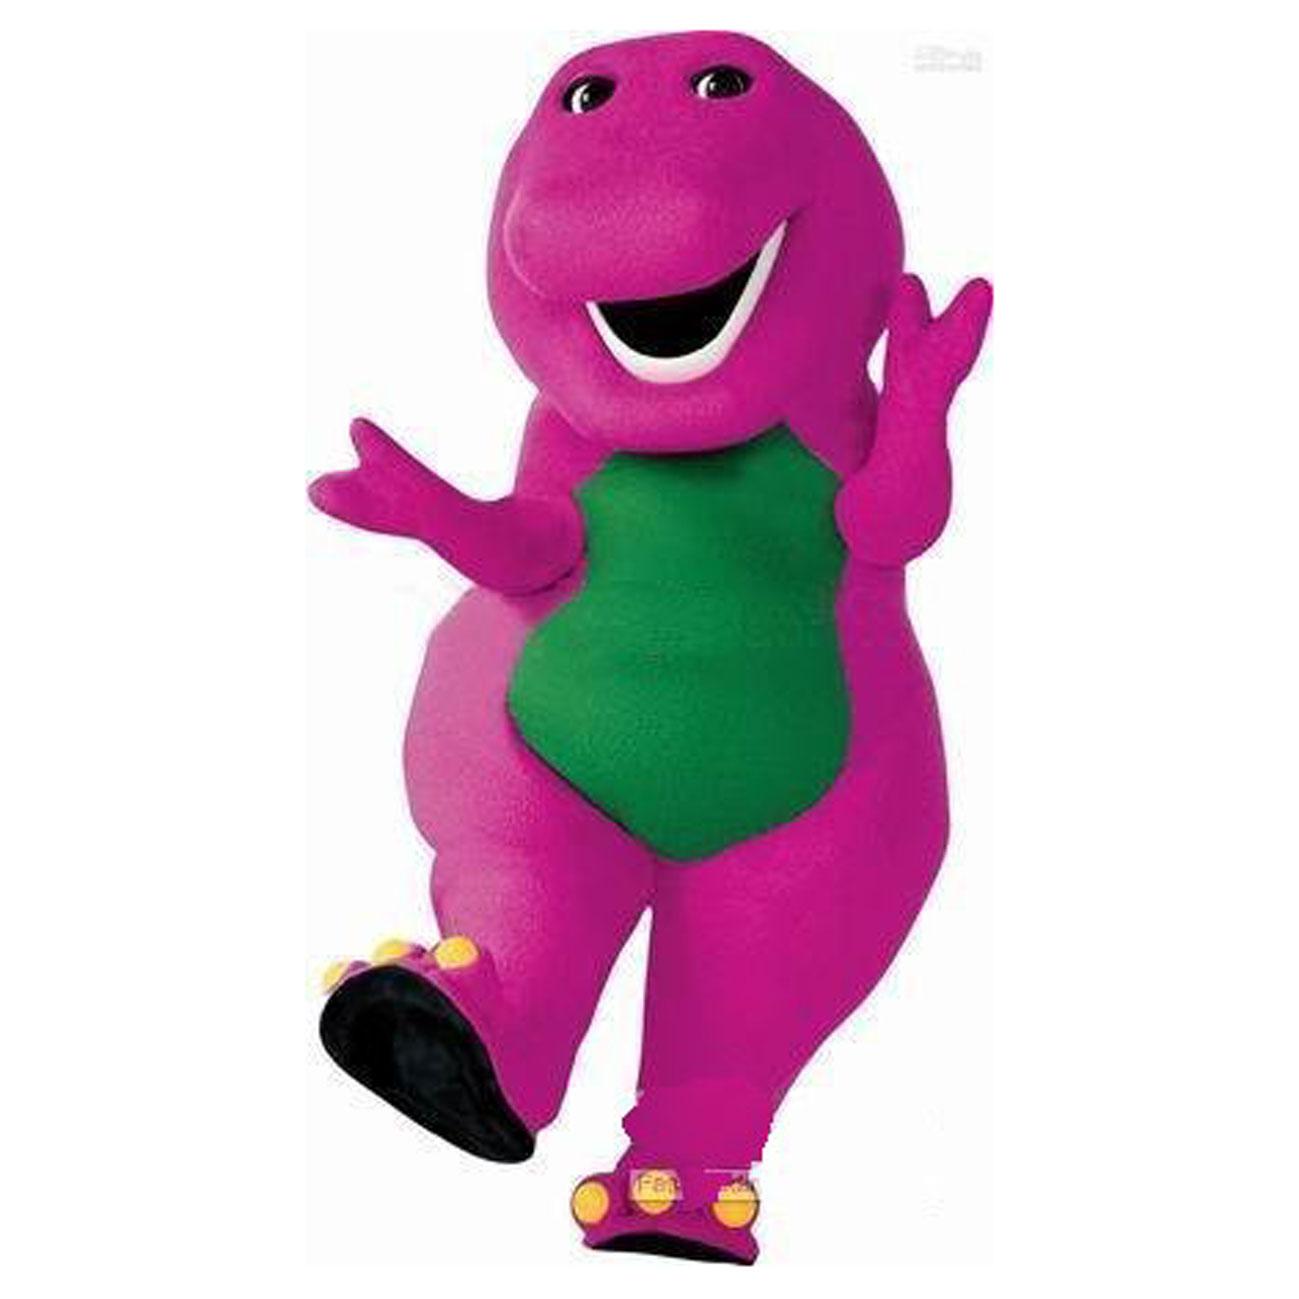 barney the dinosaur.jpg